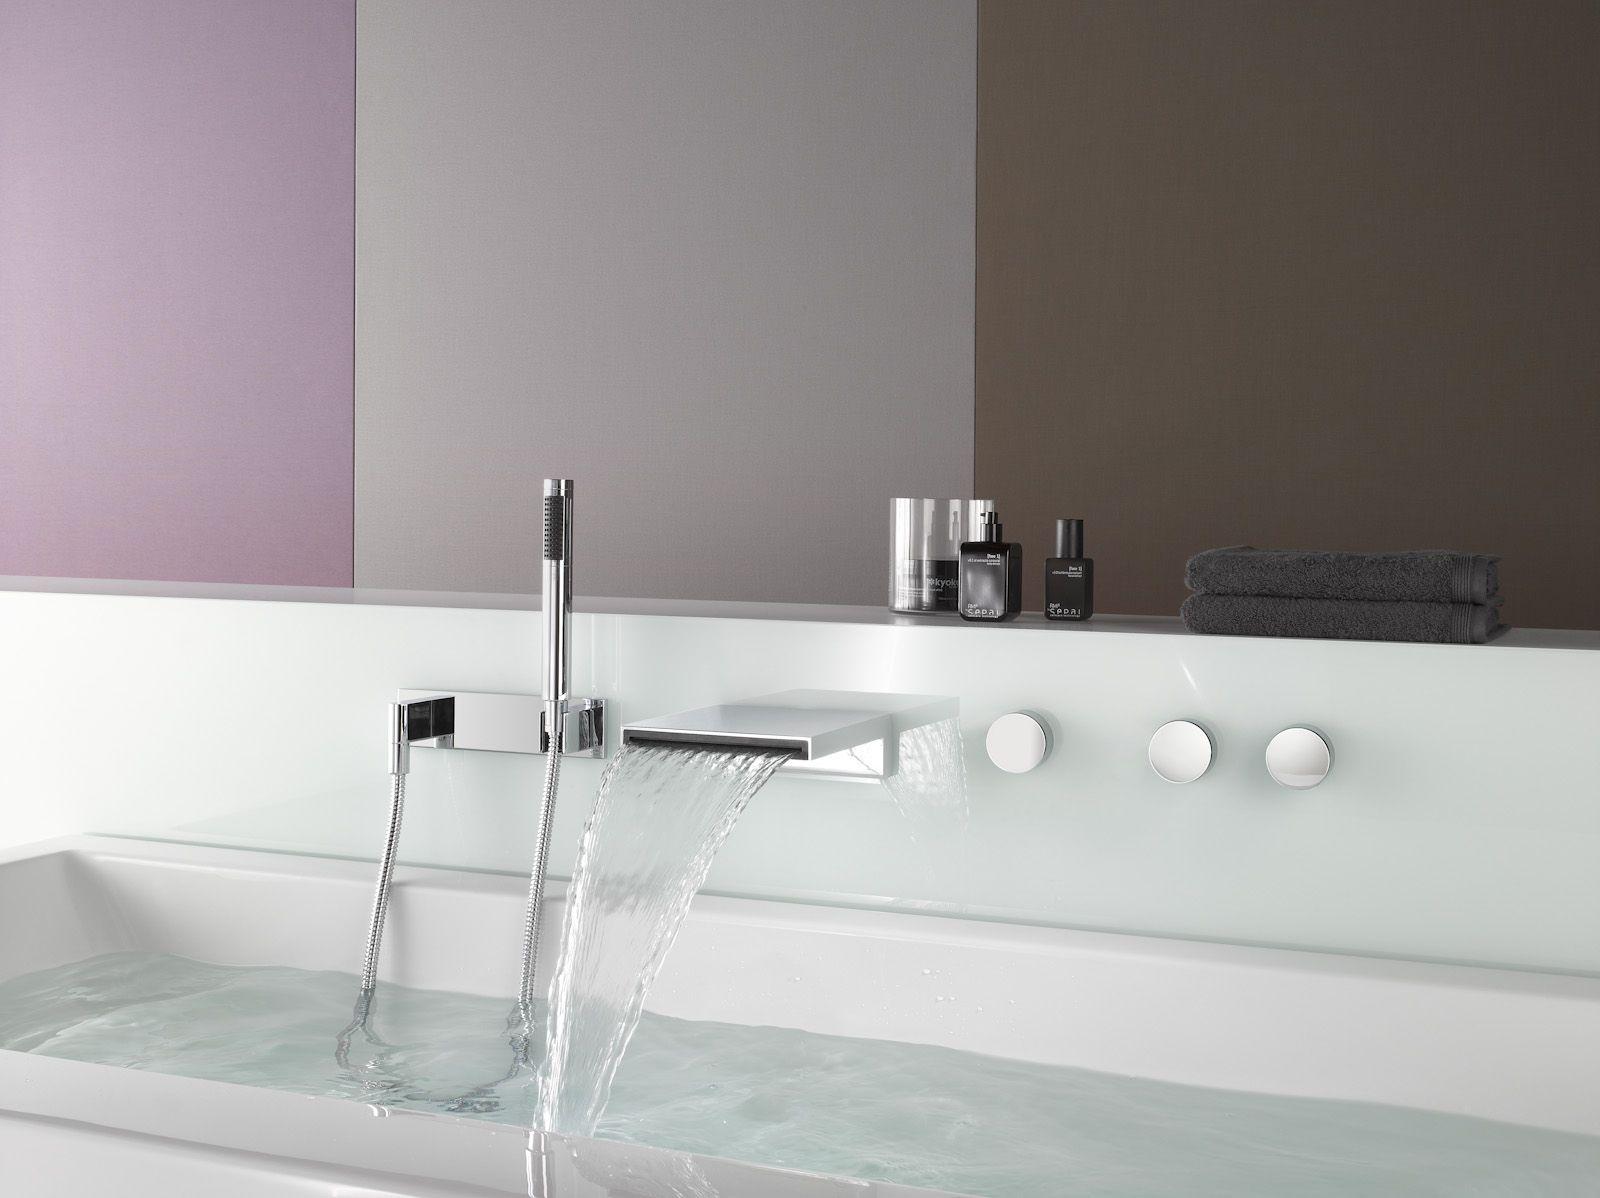 Bathroom Faucets Dornbracht deque / bath & spa / fitting / dornbracht | salle de bains